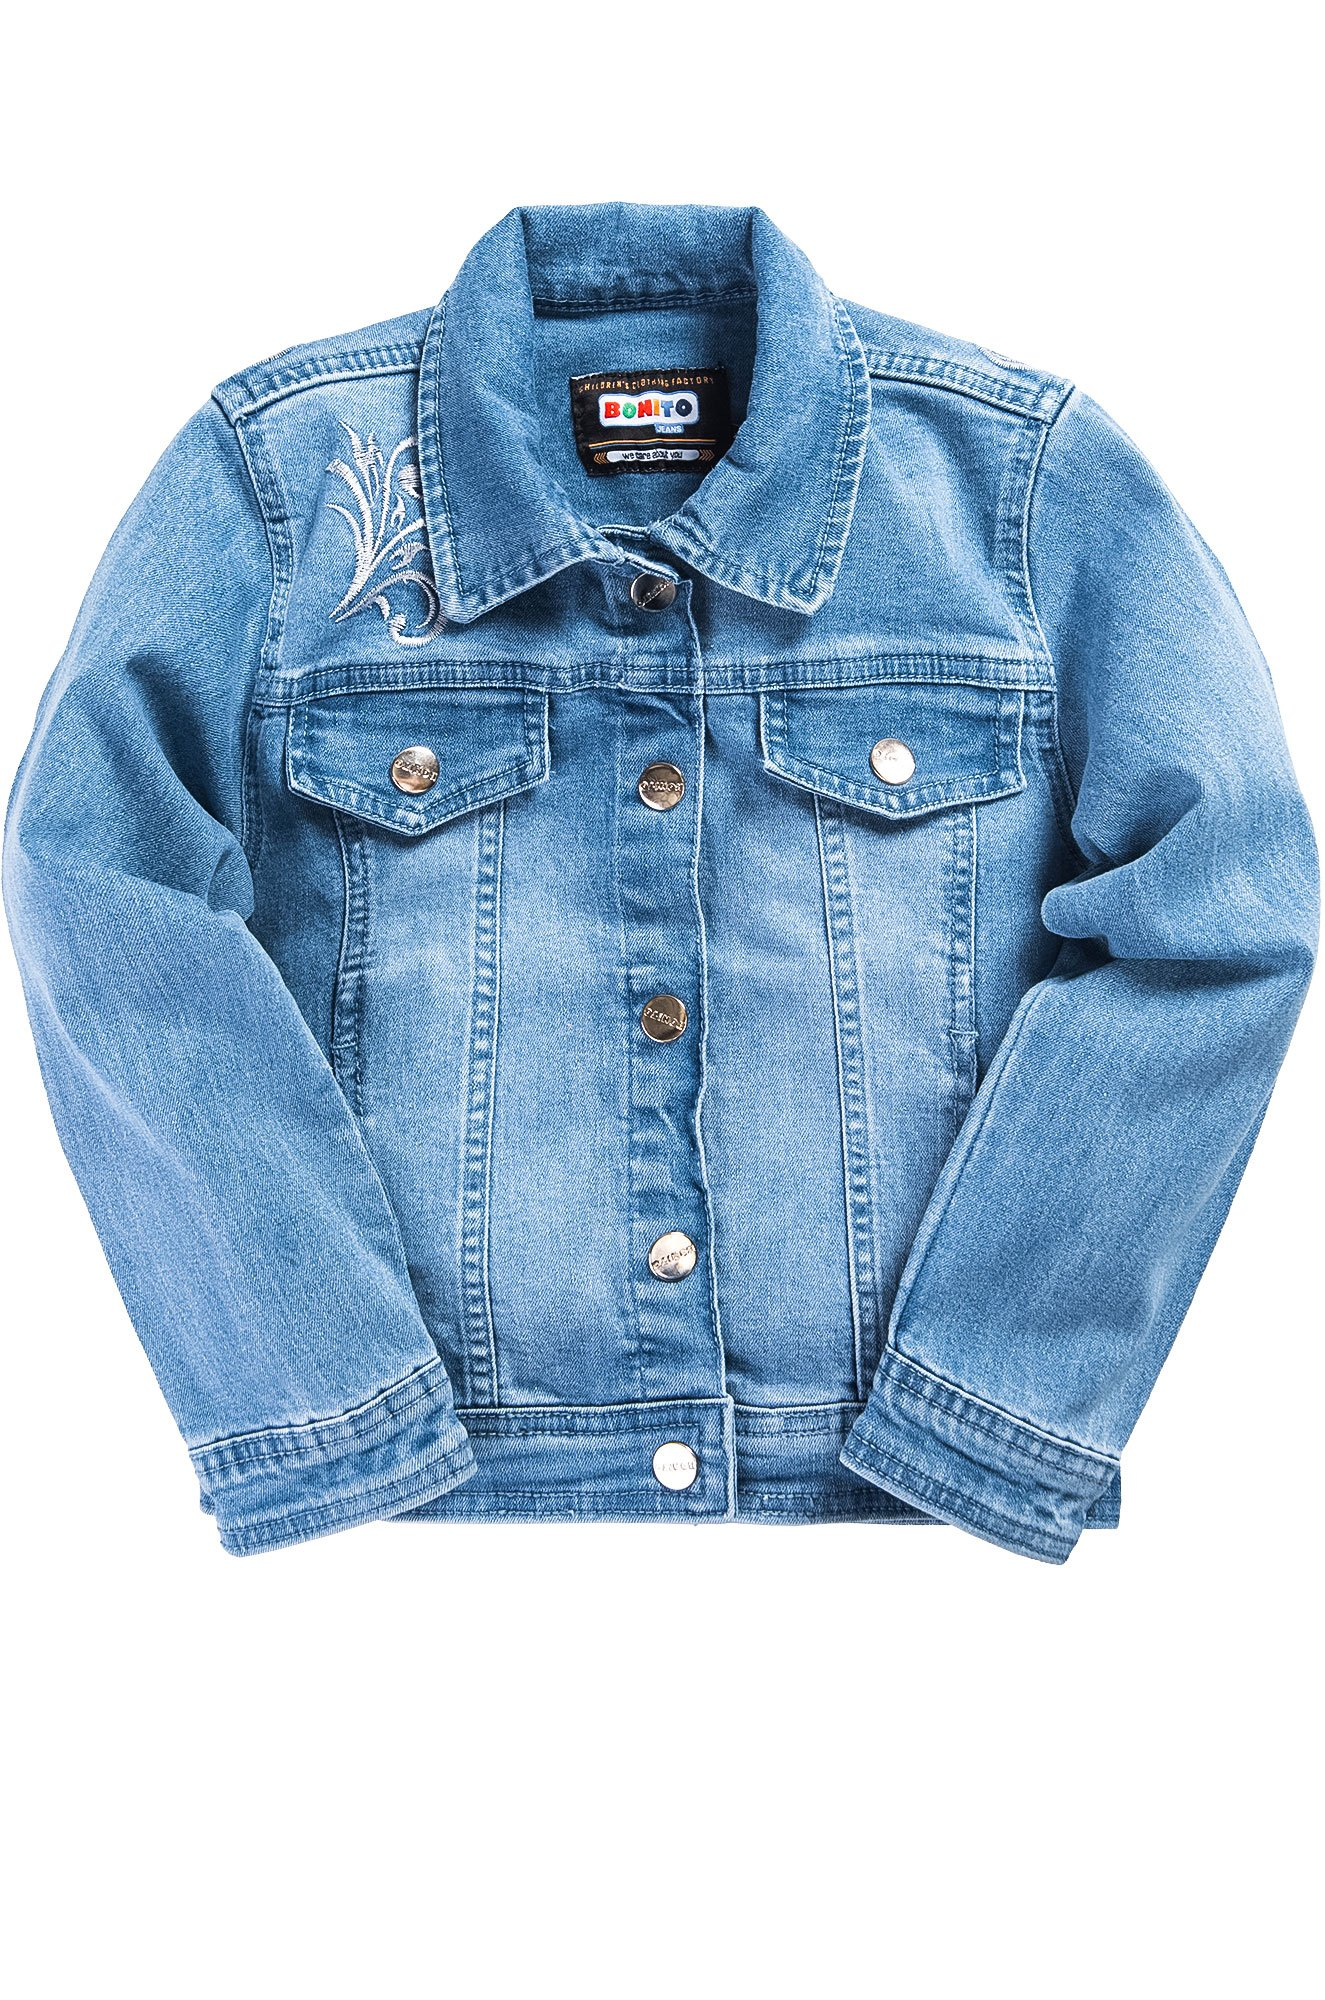 Курточка для девочки Bonito